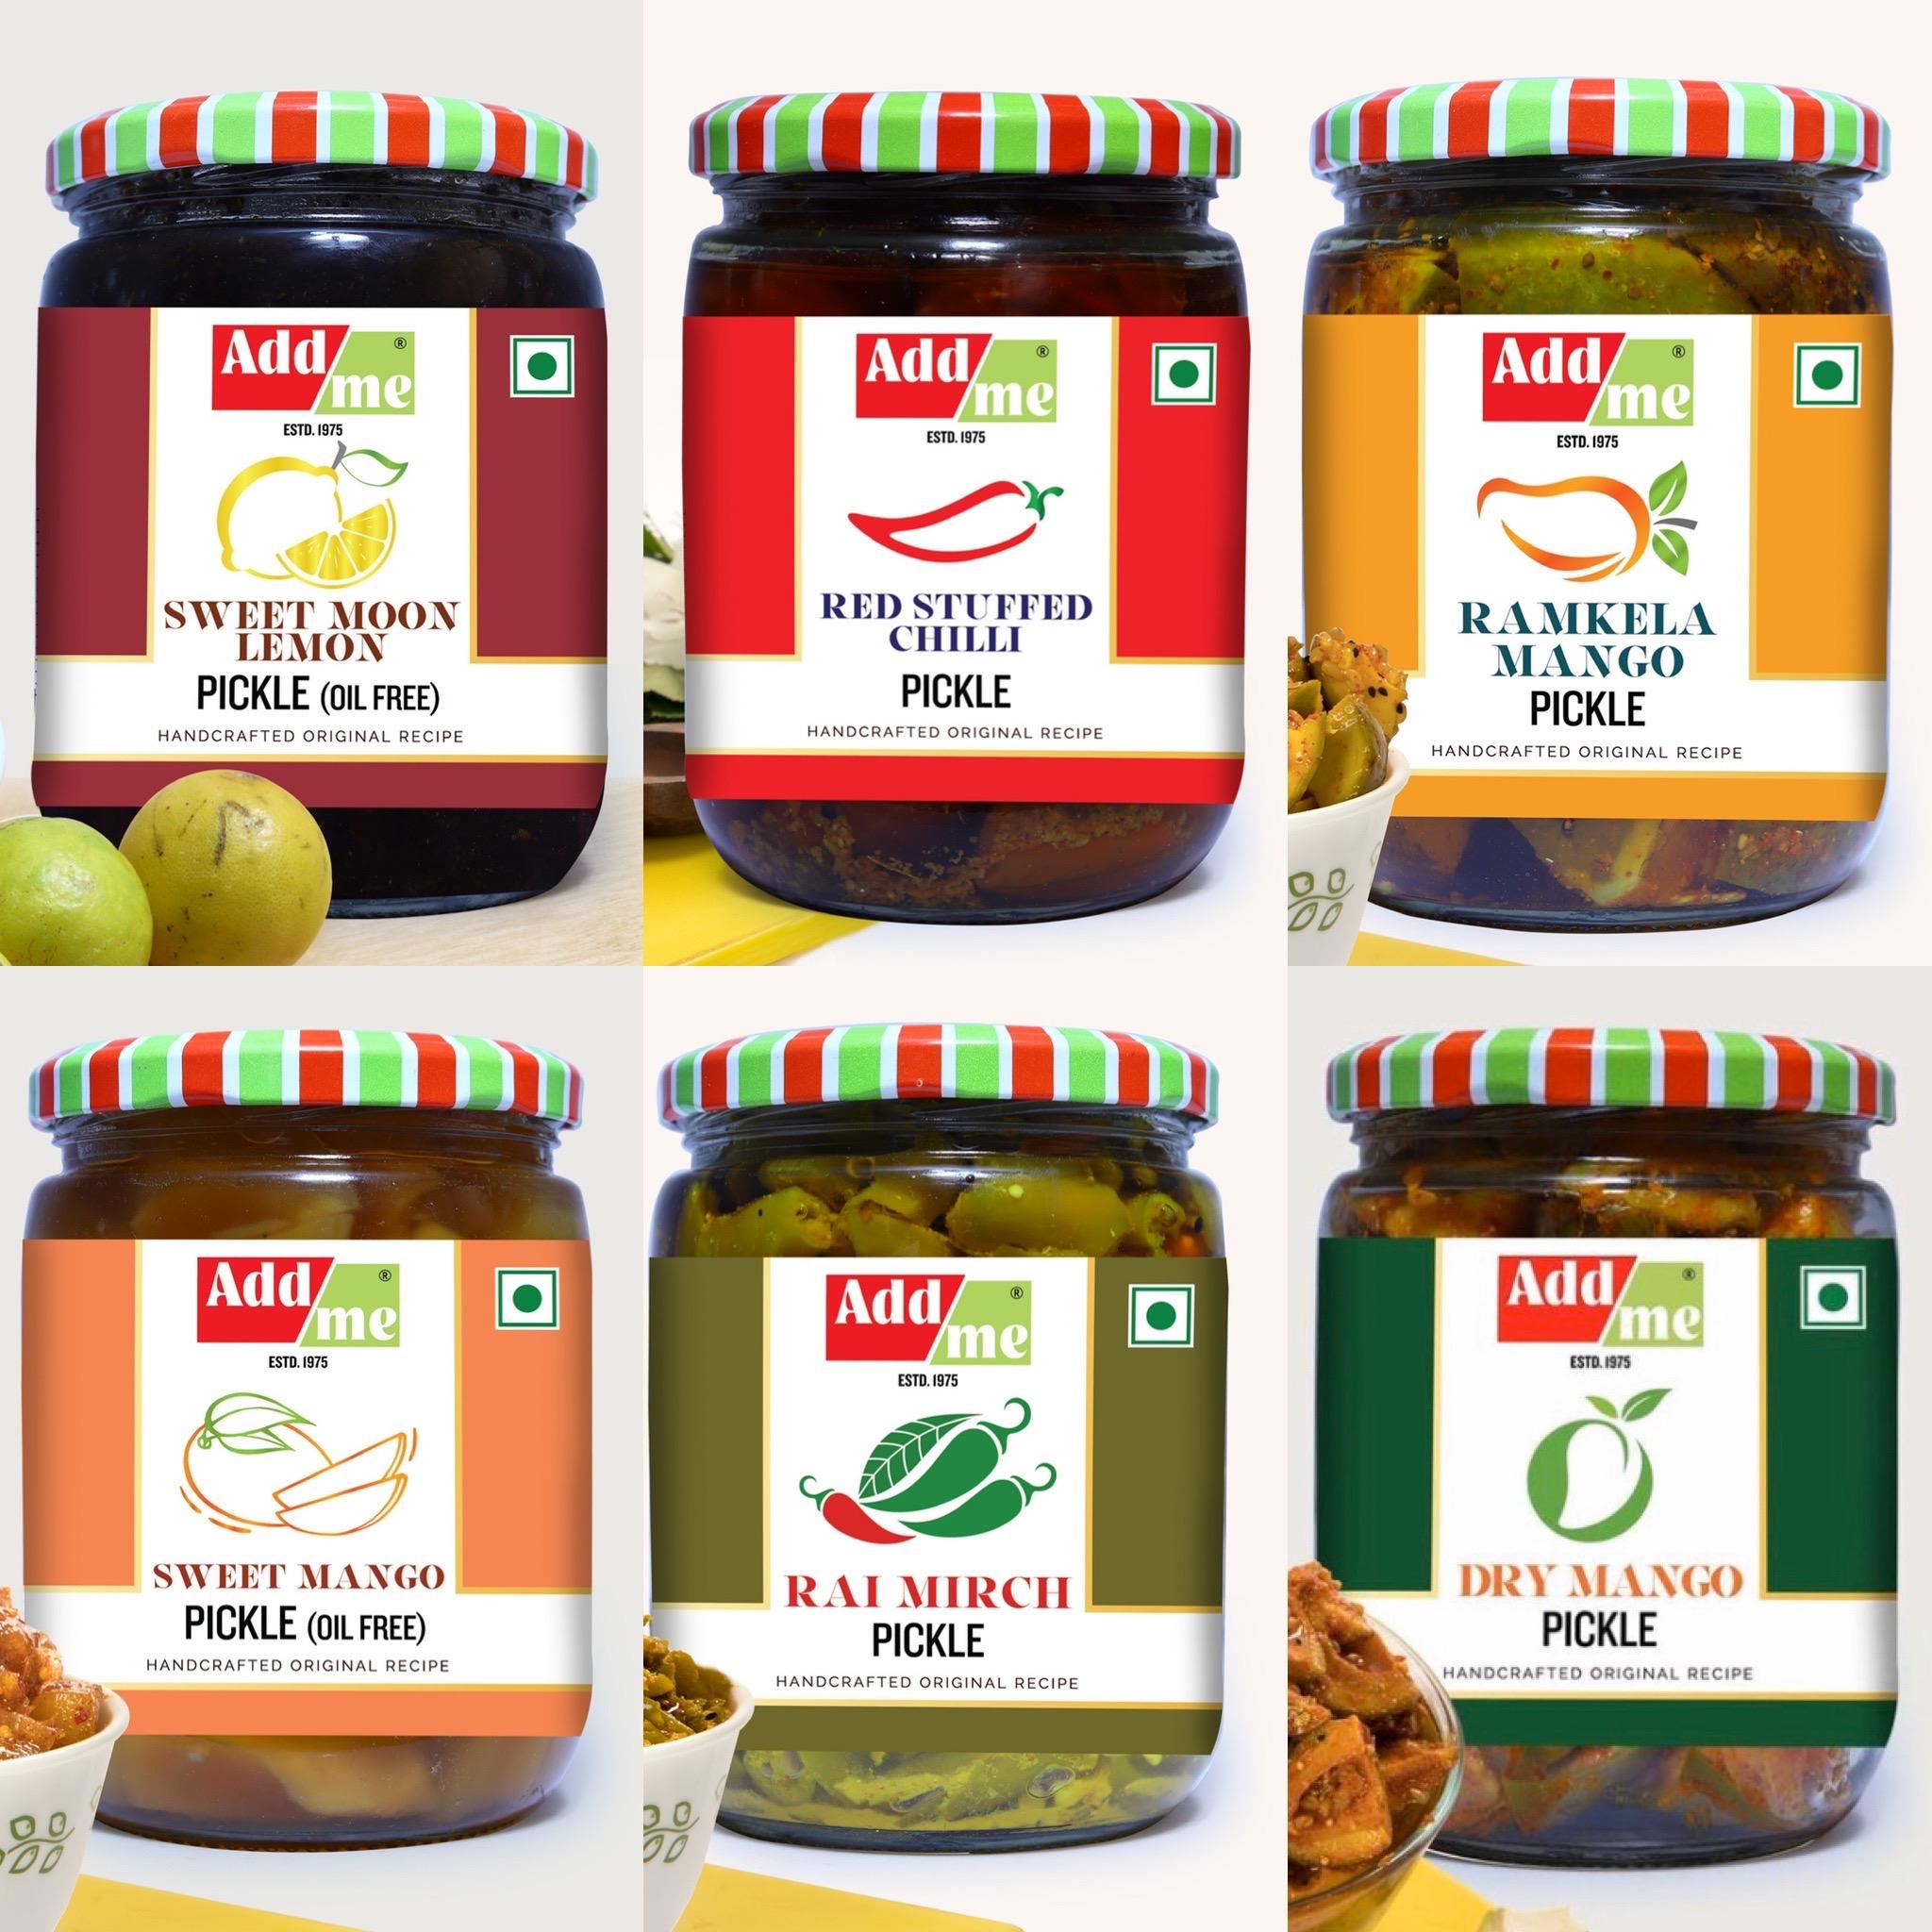 Best Seller Combo 6 In 1. Add Me Ramkela Mango Pickles 500gm Aam Ka Achar, Sweet Lime Pickles 600 Gm Nimbu Ka Achar, Green Chilli Pickles 500gm Mirch Ka Achar, Sweet Mango Pickles 600gm, Dry Mango Pickles 500gm, Red Stuffed Chilli Pickles 500gm =